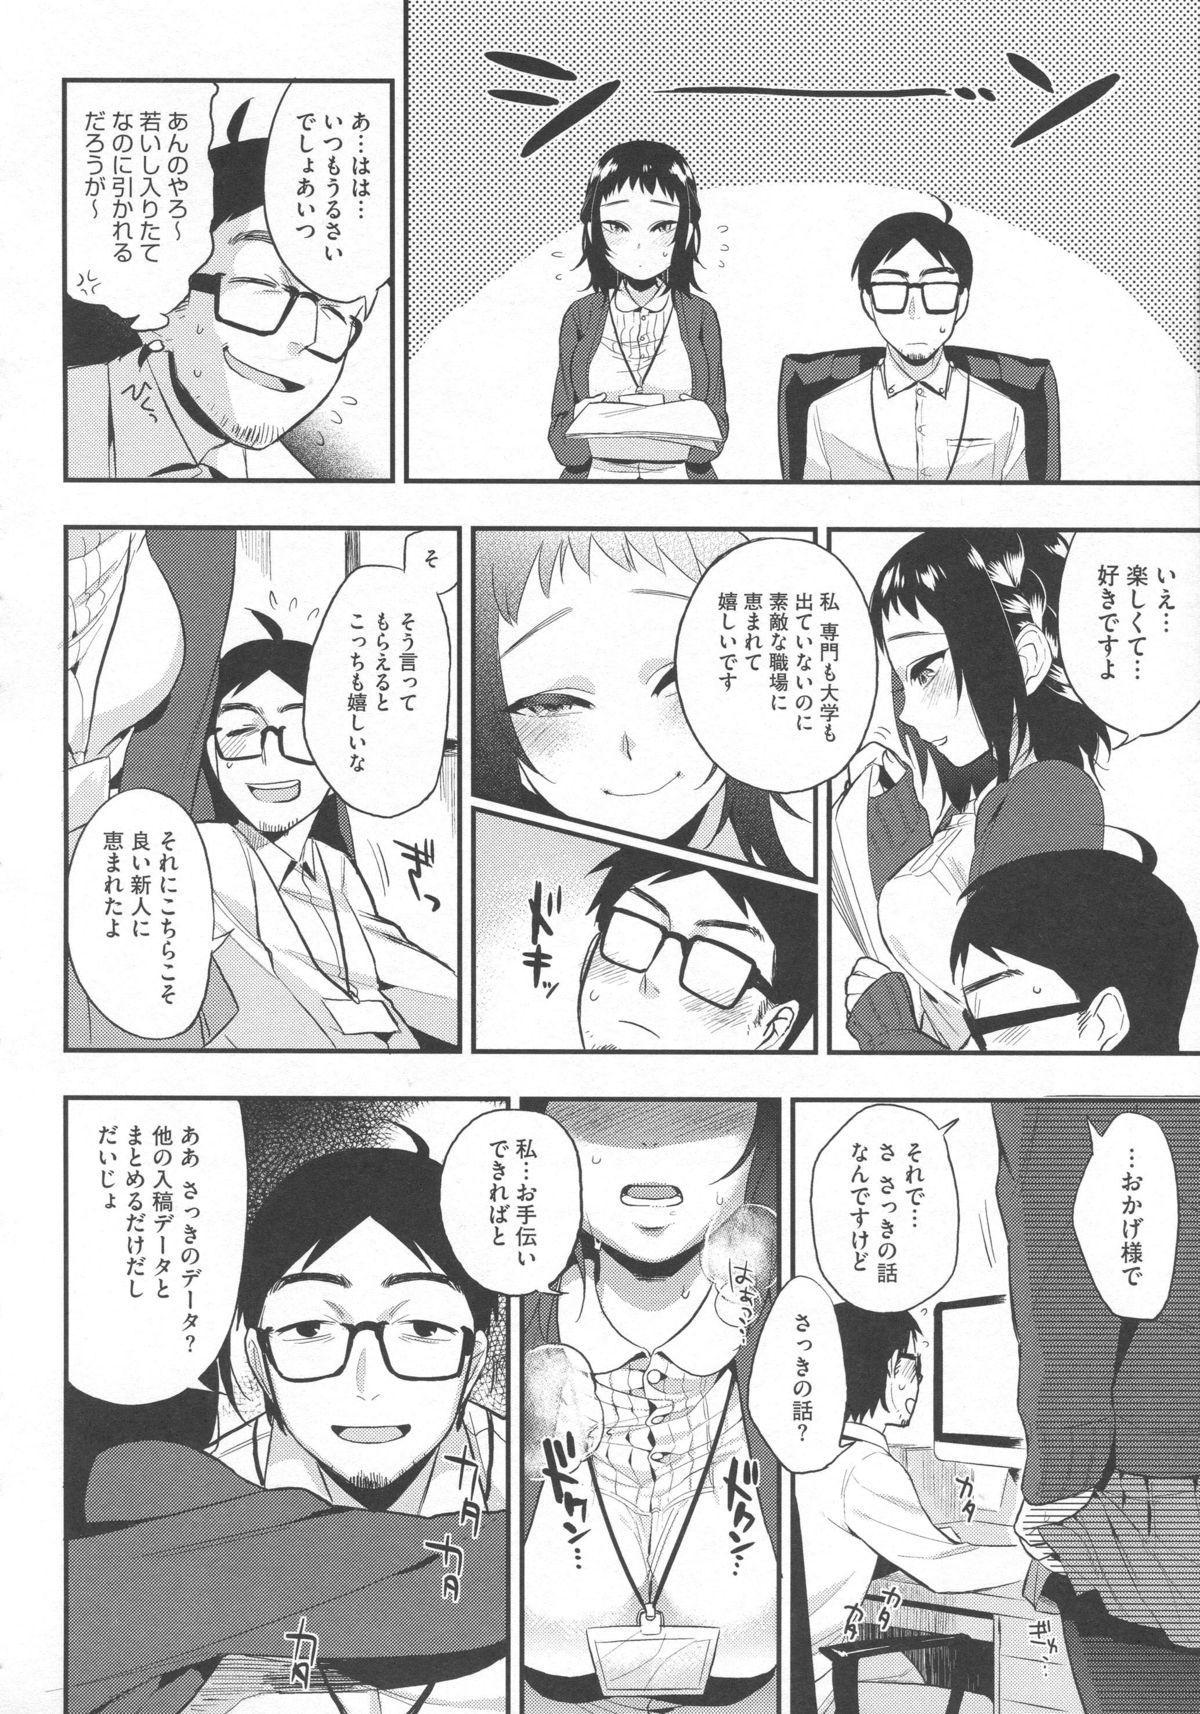 Boku Dake no Yuuyami - Only My Twilight 112